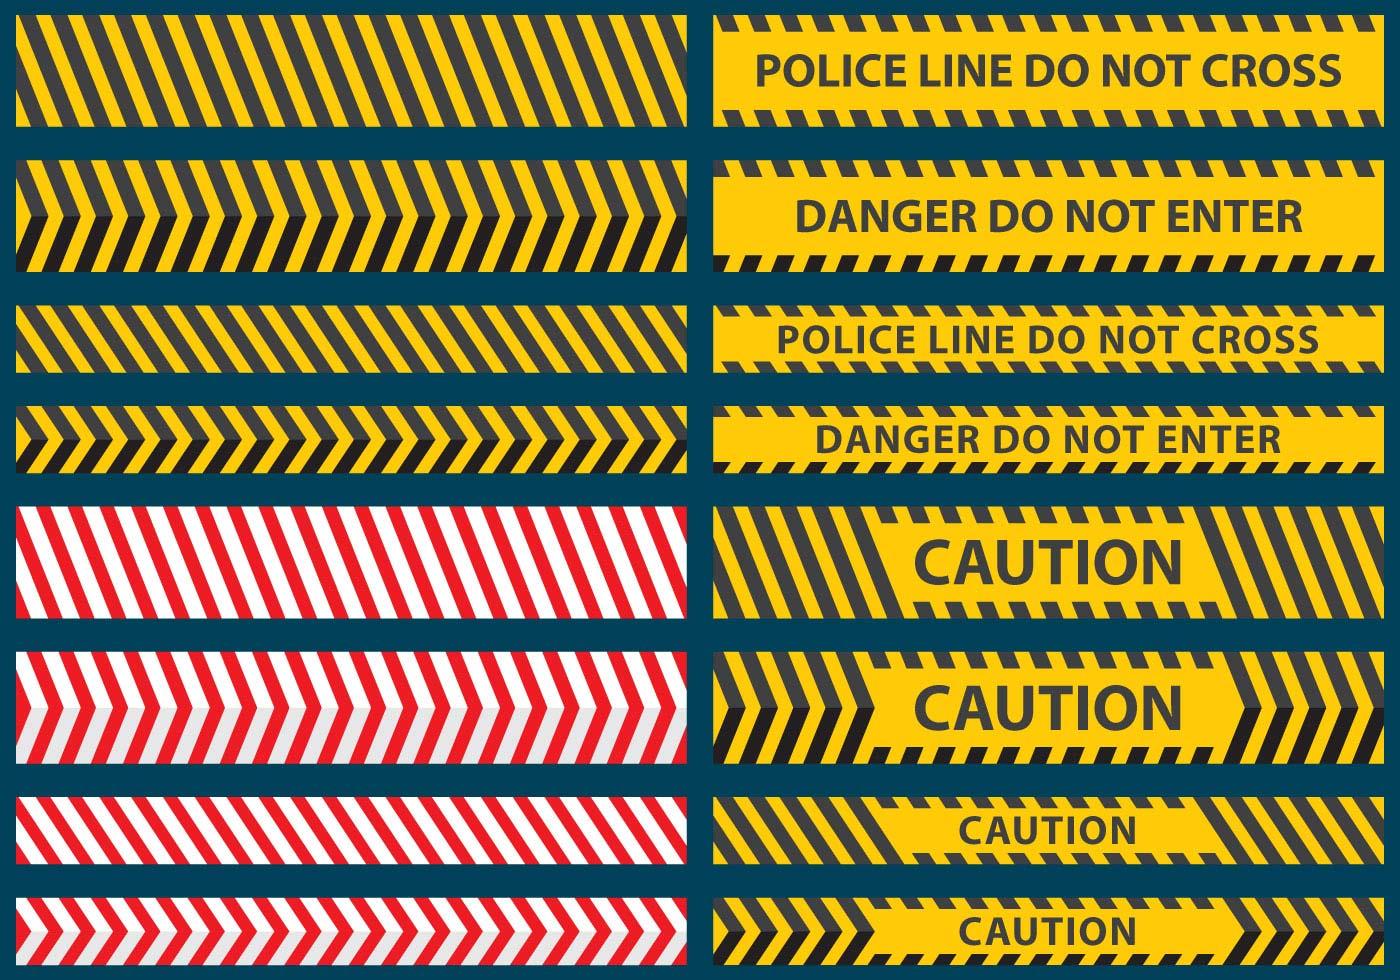 police line tape vectors download free vector art  stock Solid Tape Vector caution tape vector free